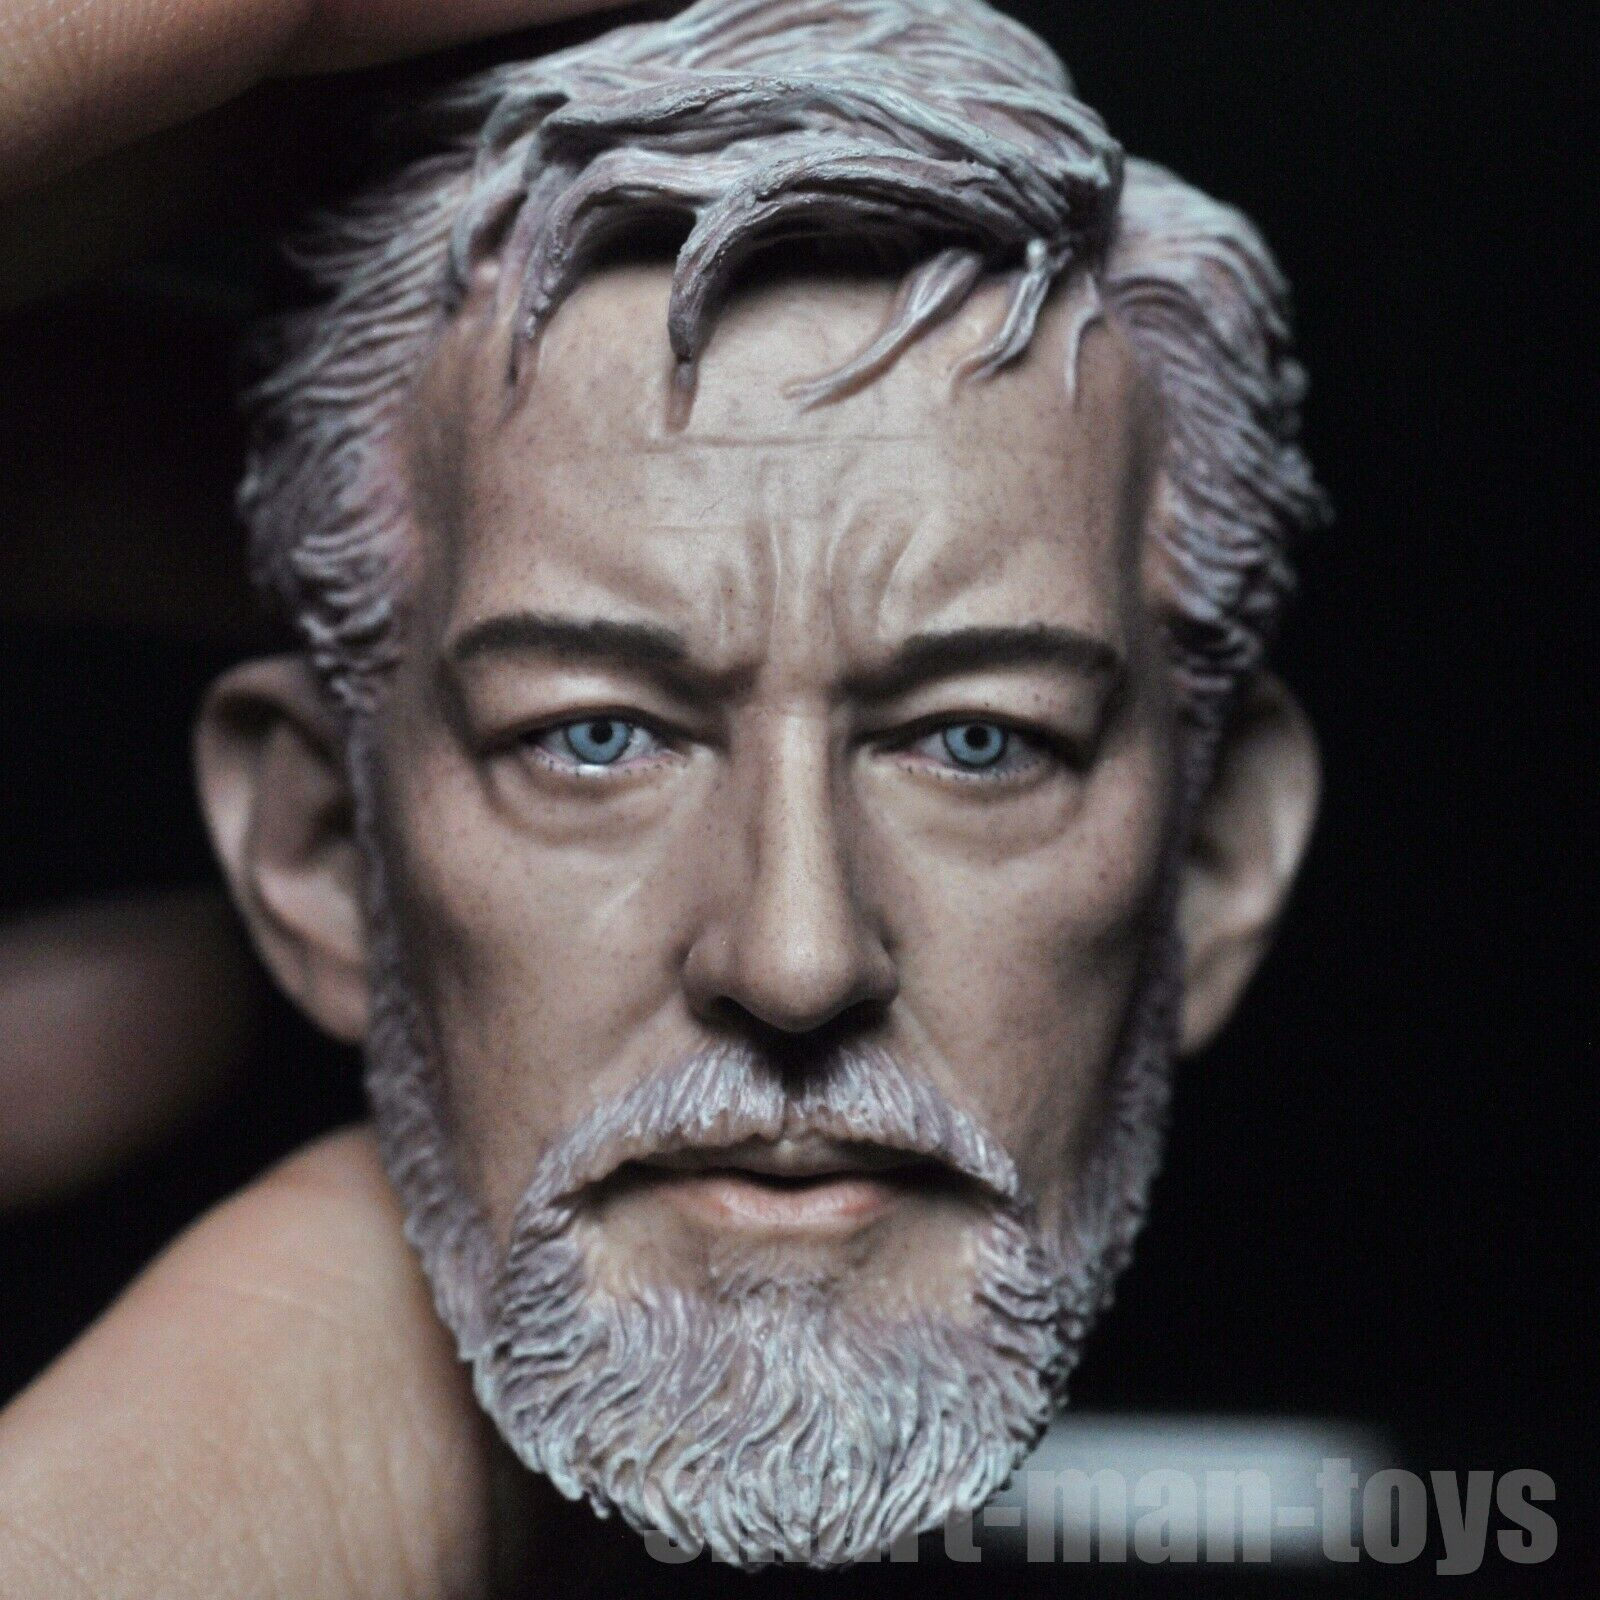 1//6 scale Obi-Wan Kenobi Head Sculpt Star Wars fit 12/'/' Figure Body